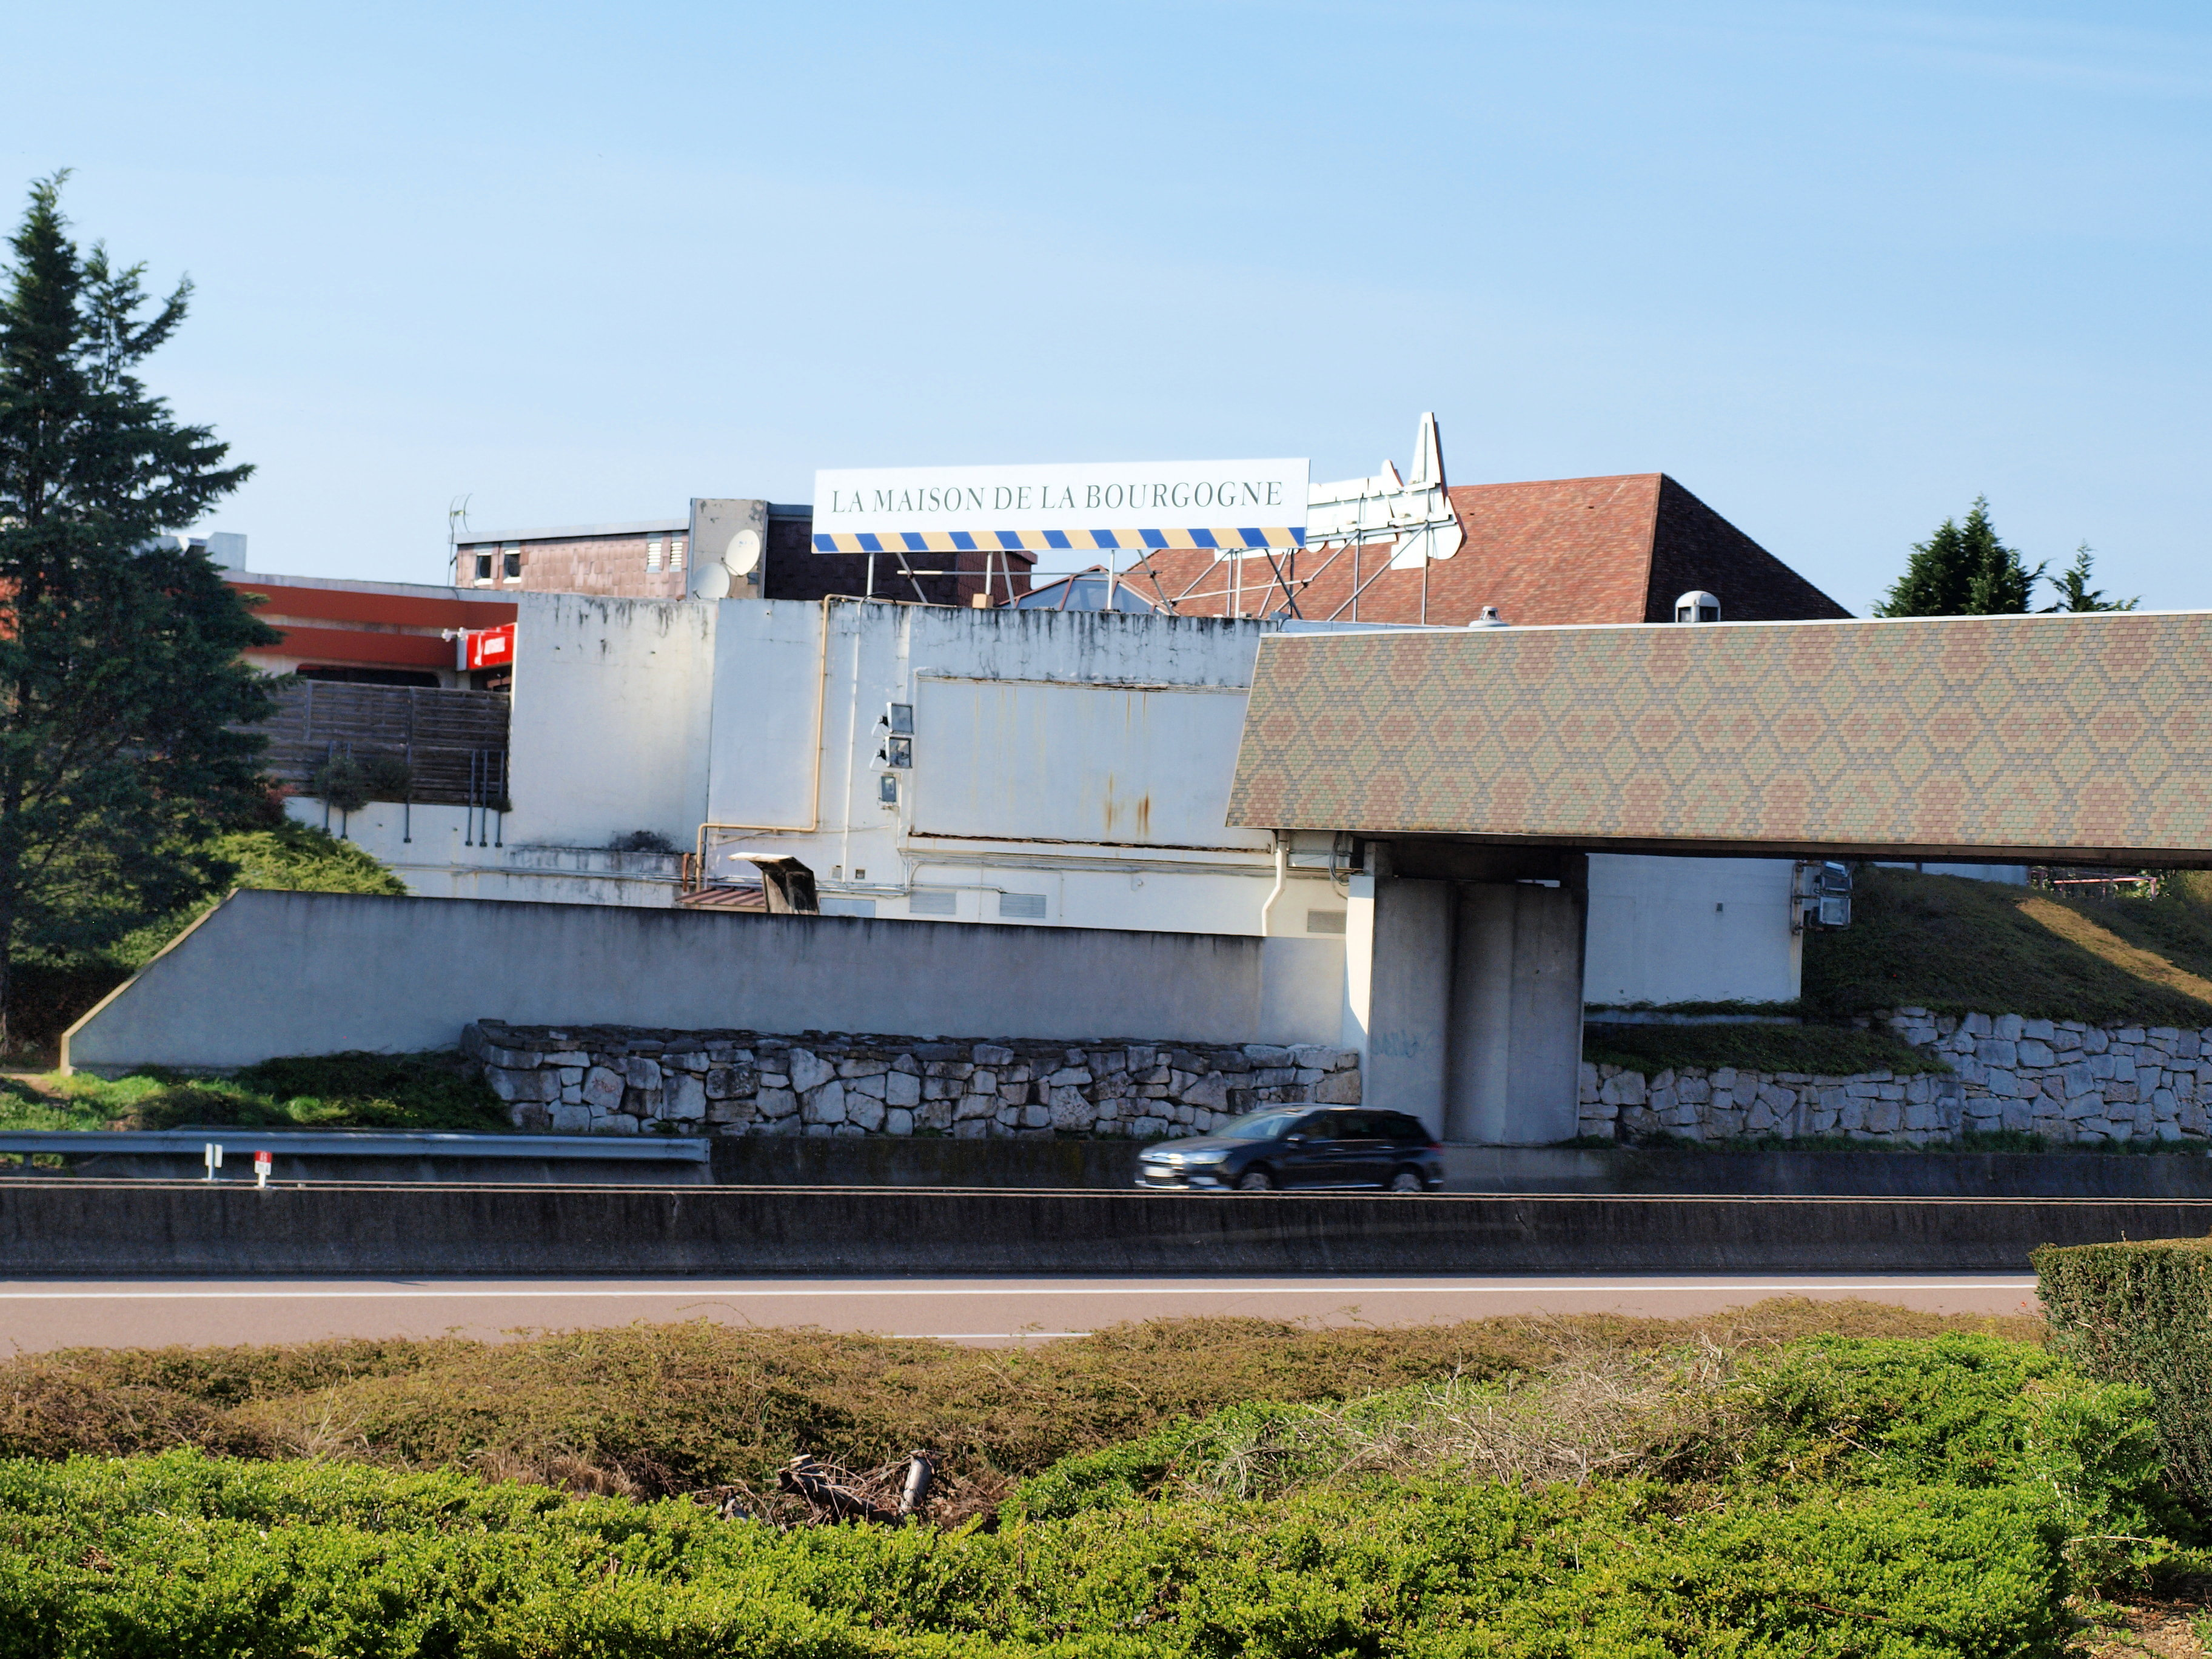 file:merceuil-fr-21-autoroute a6-aire de repos-03 - wikimedia